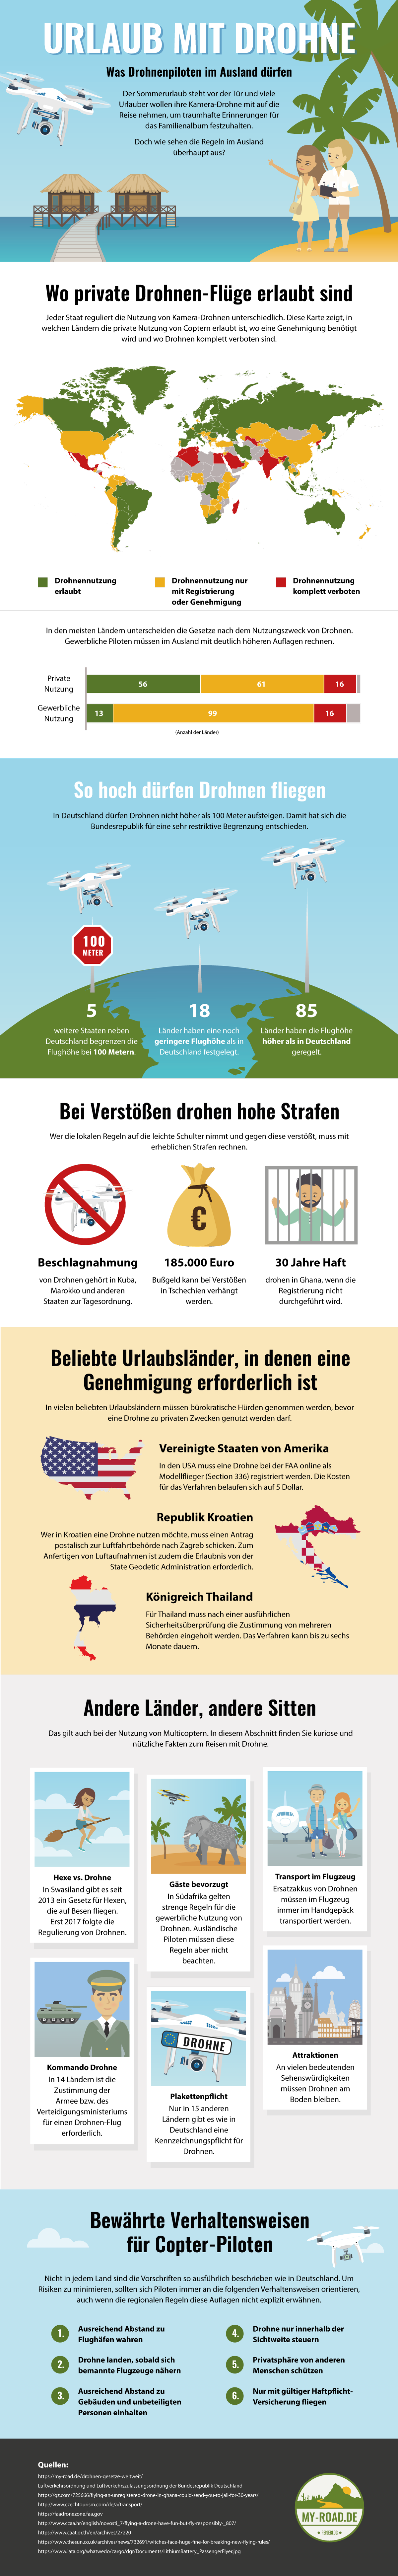 Infografik Urlaub mit Drohne